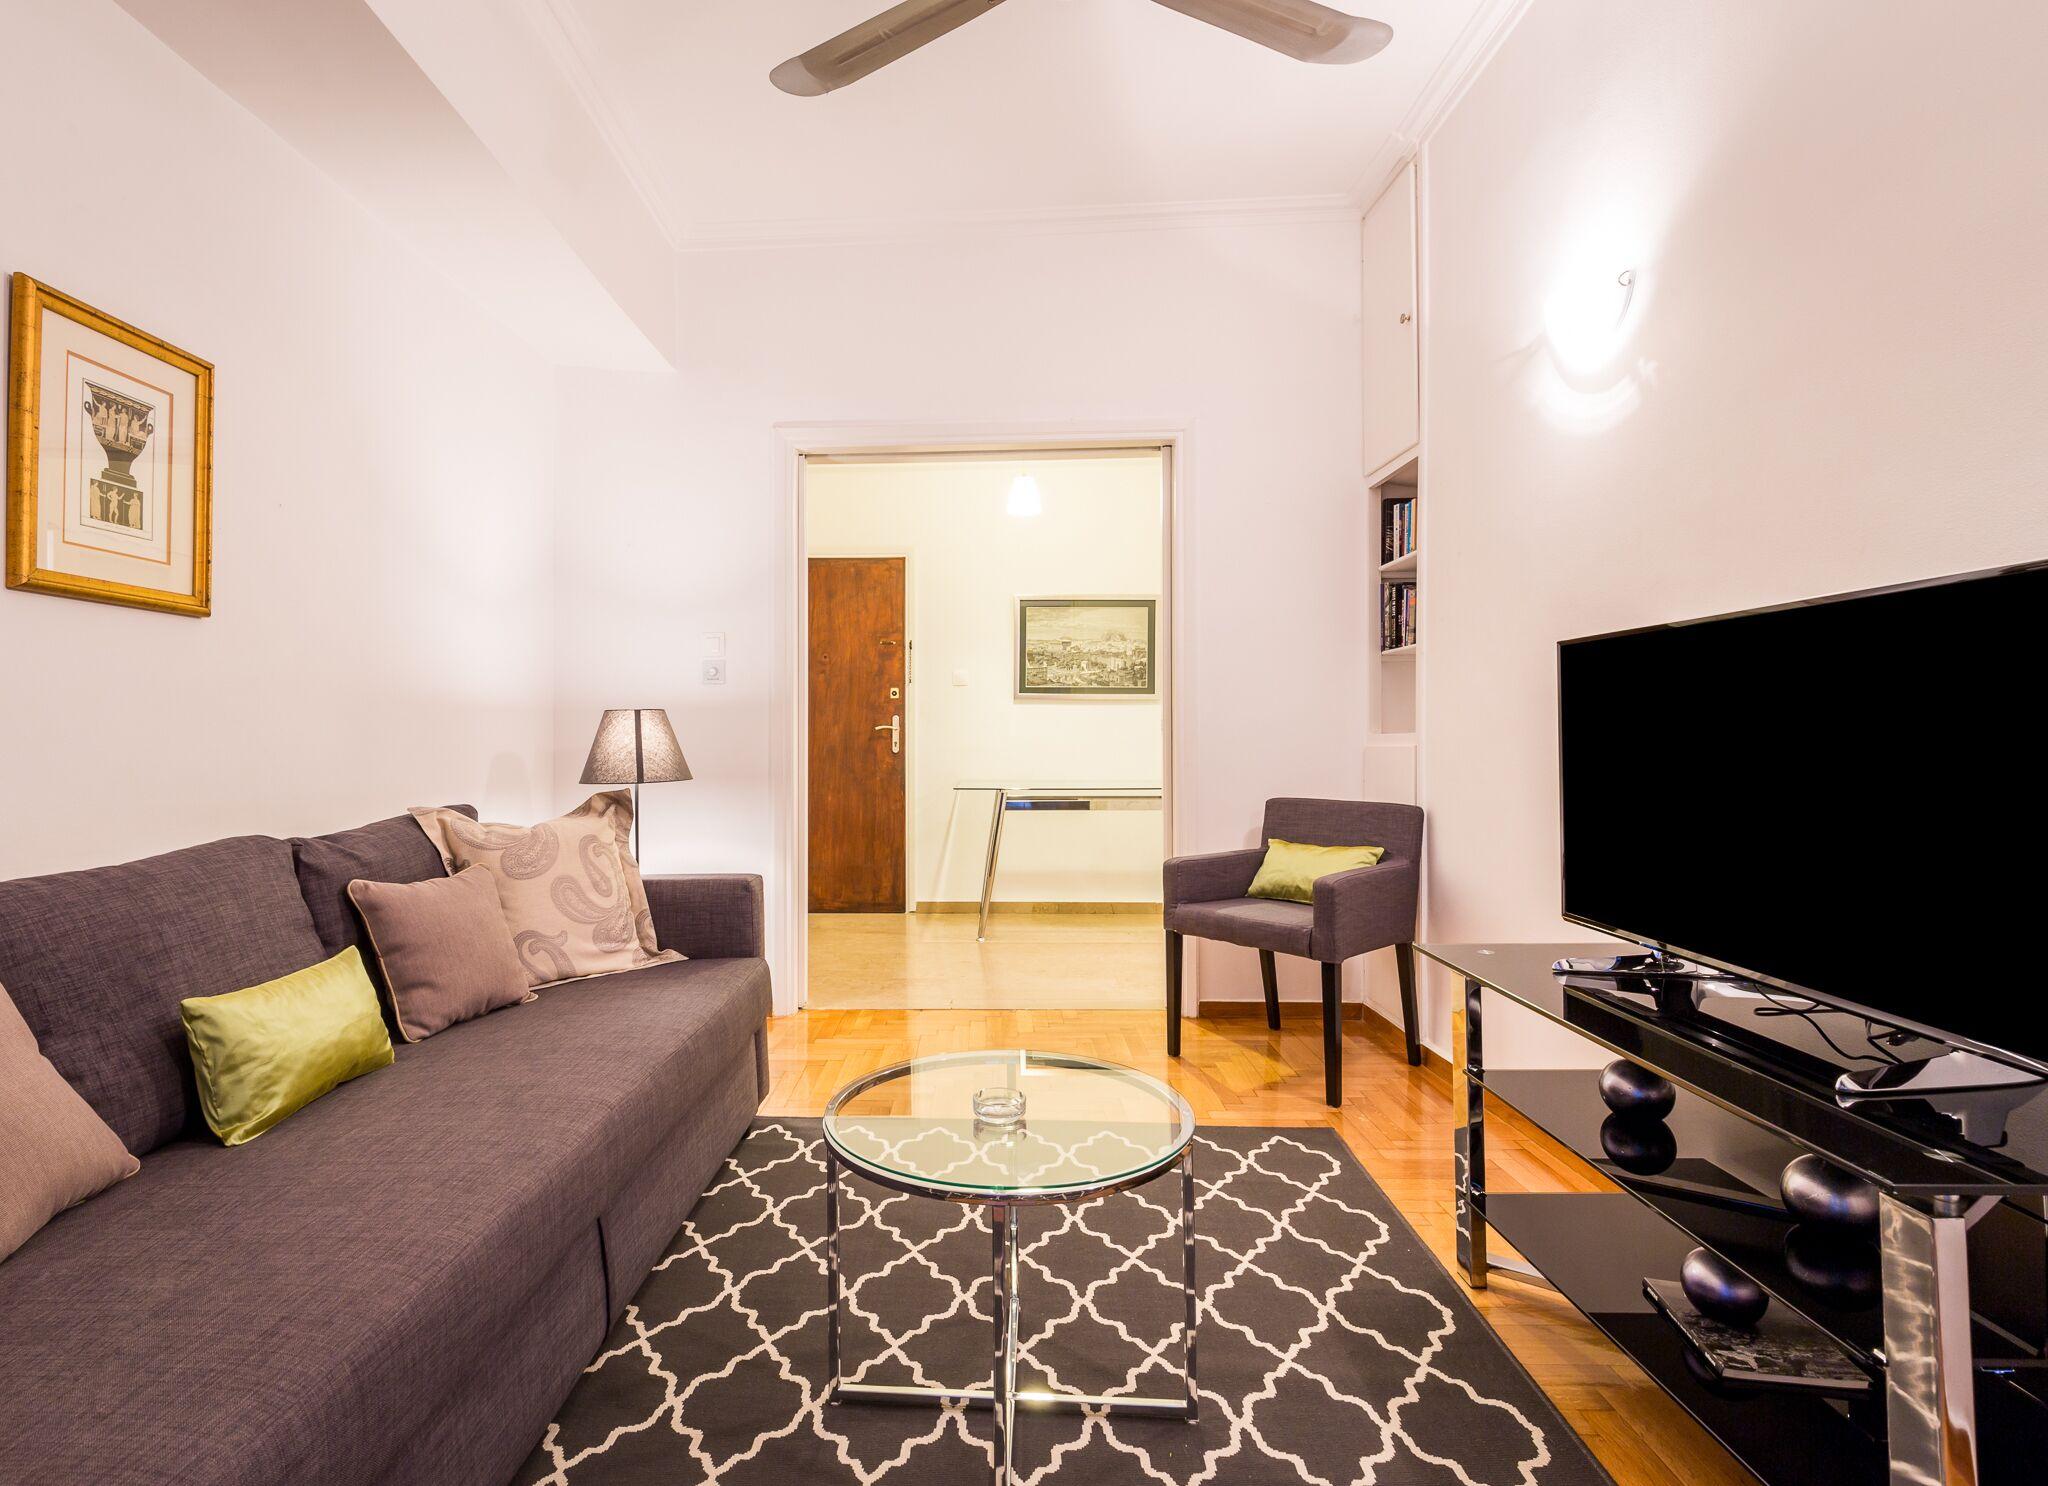 Homey Apartment For 4 People In Koukaki